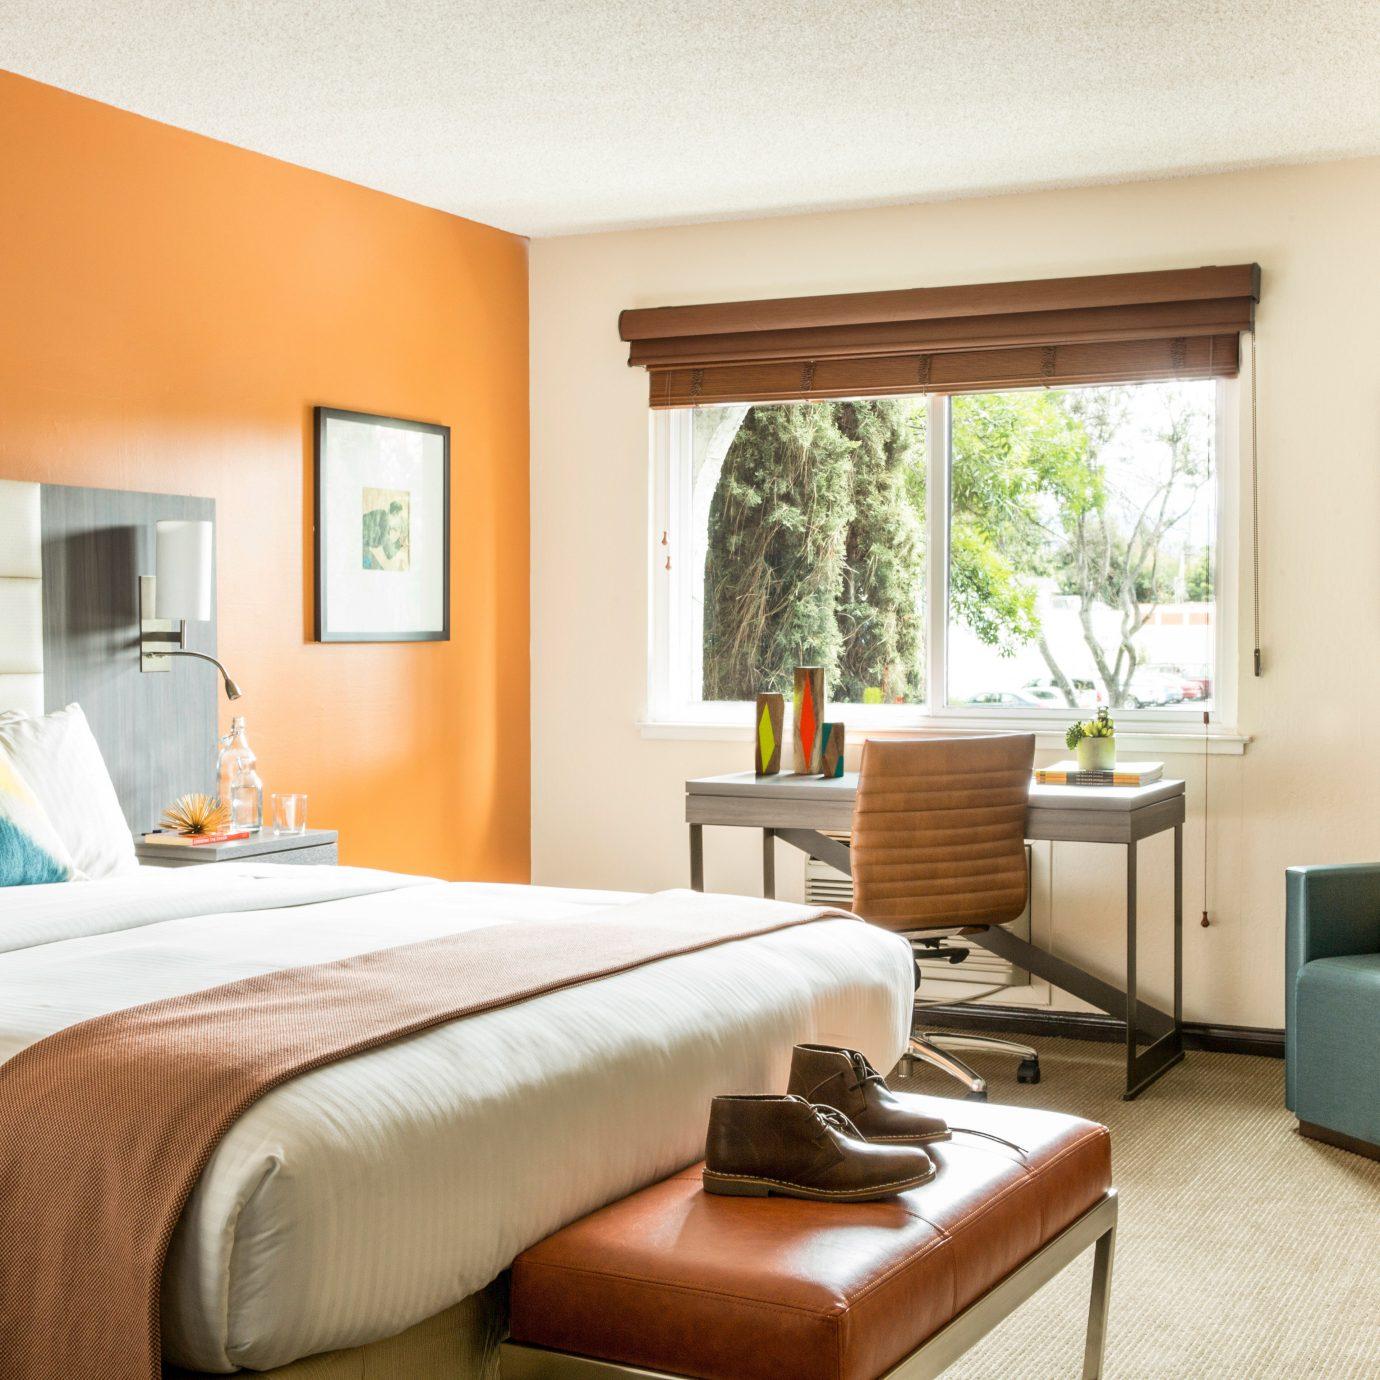 Bedroom Lounge Luxury Modern Suite sofa property living room home cottage condominium orange